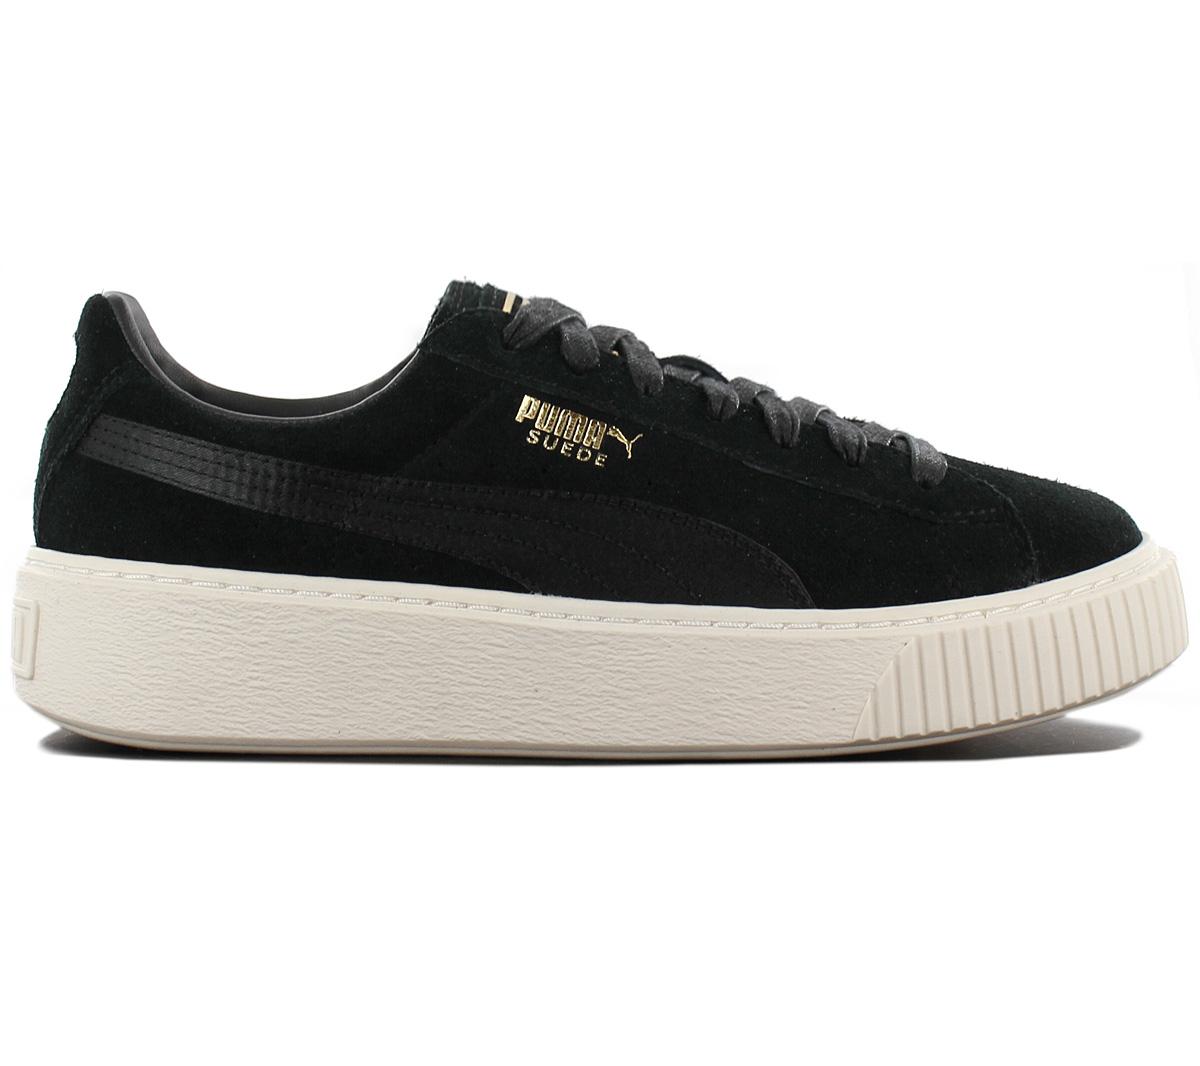 27693e21481 Puma Gamuza De Plataforma Zapatos tenis de cuero de satén señoras ...